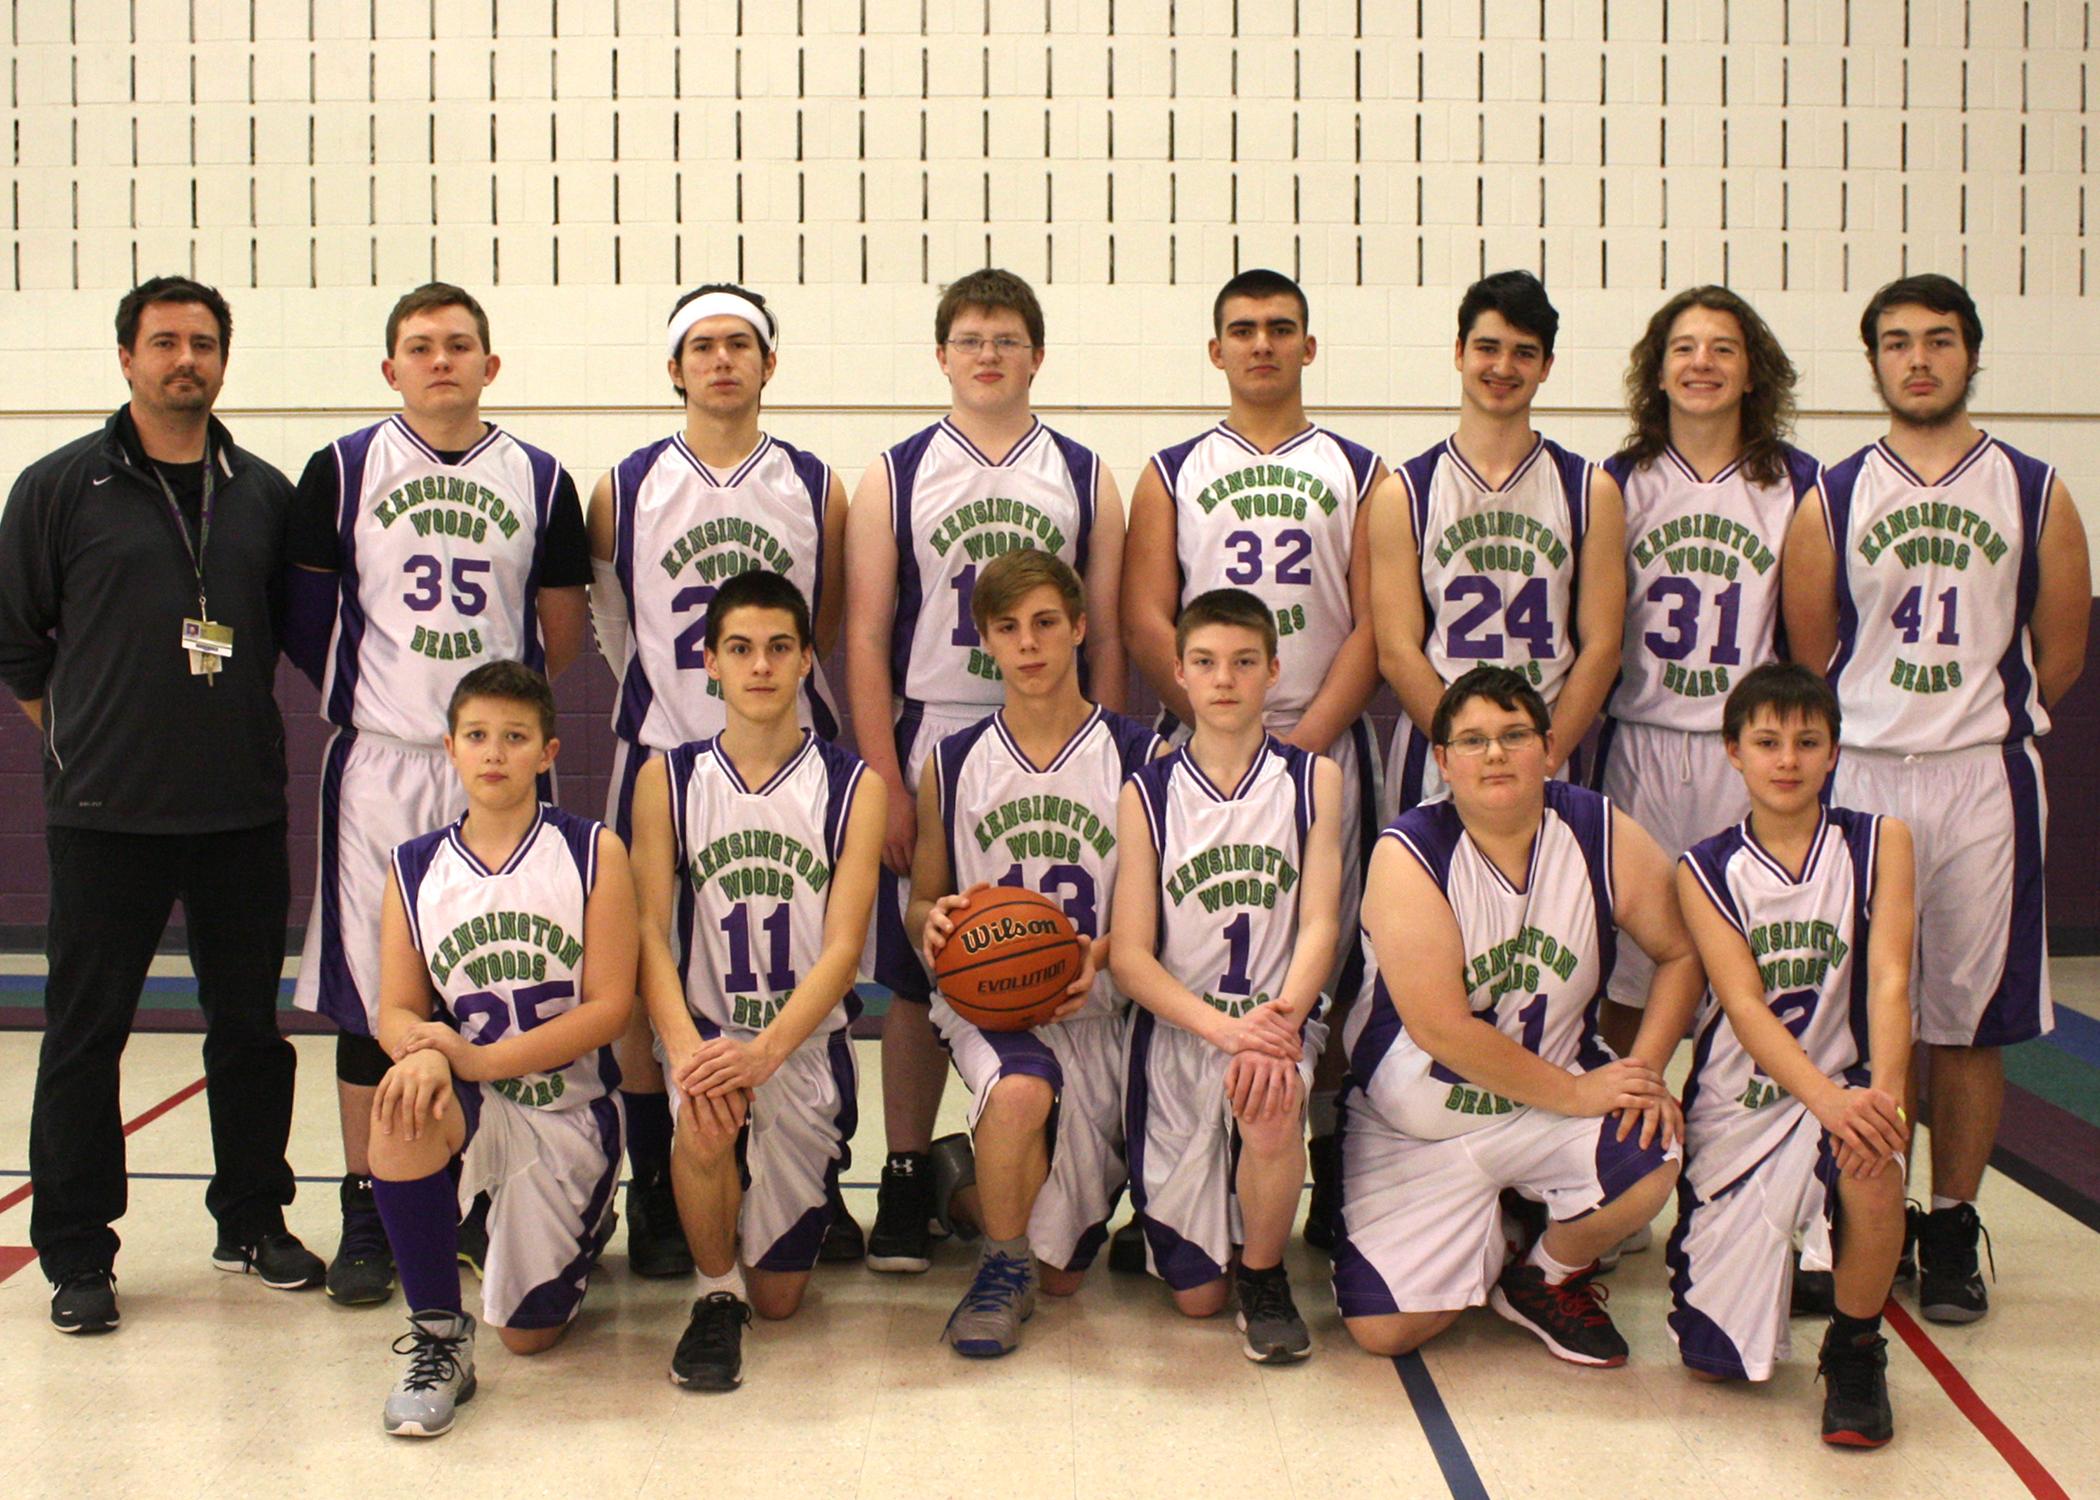 Kensington Woods Schools Boys Basketball, 2016-2017